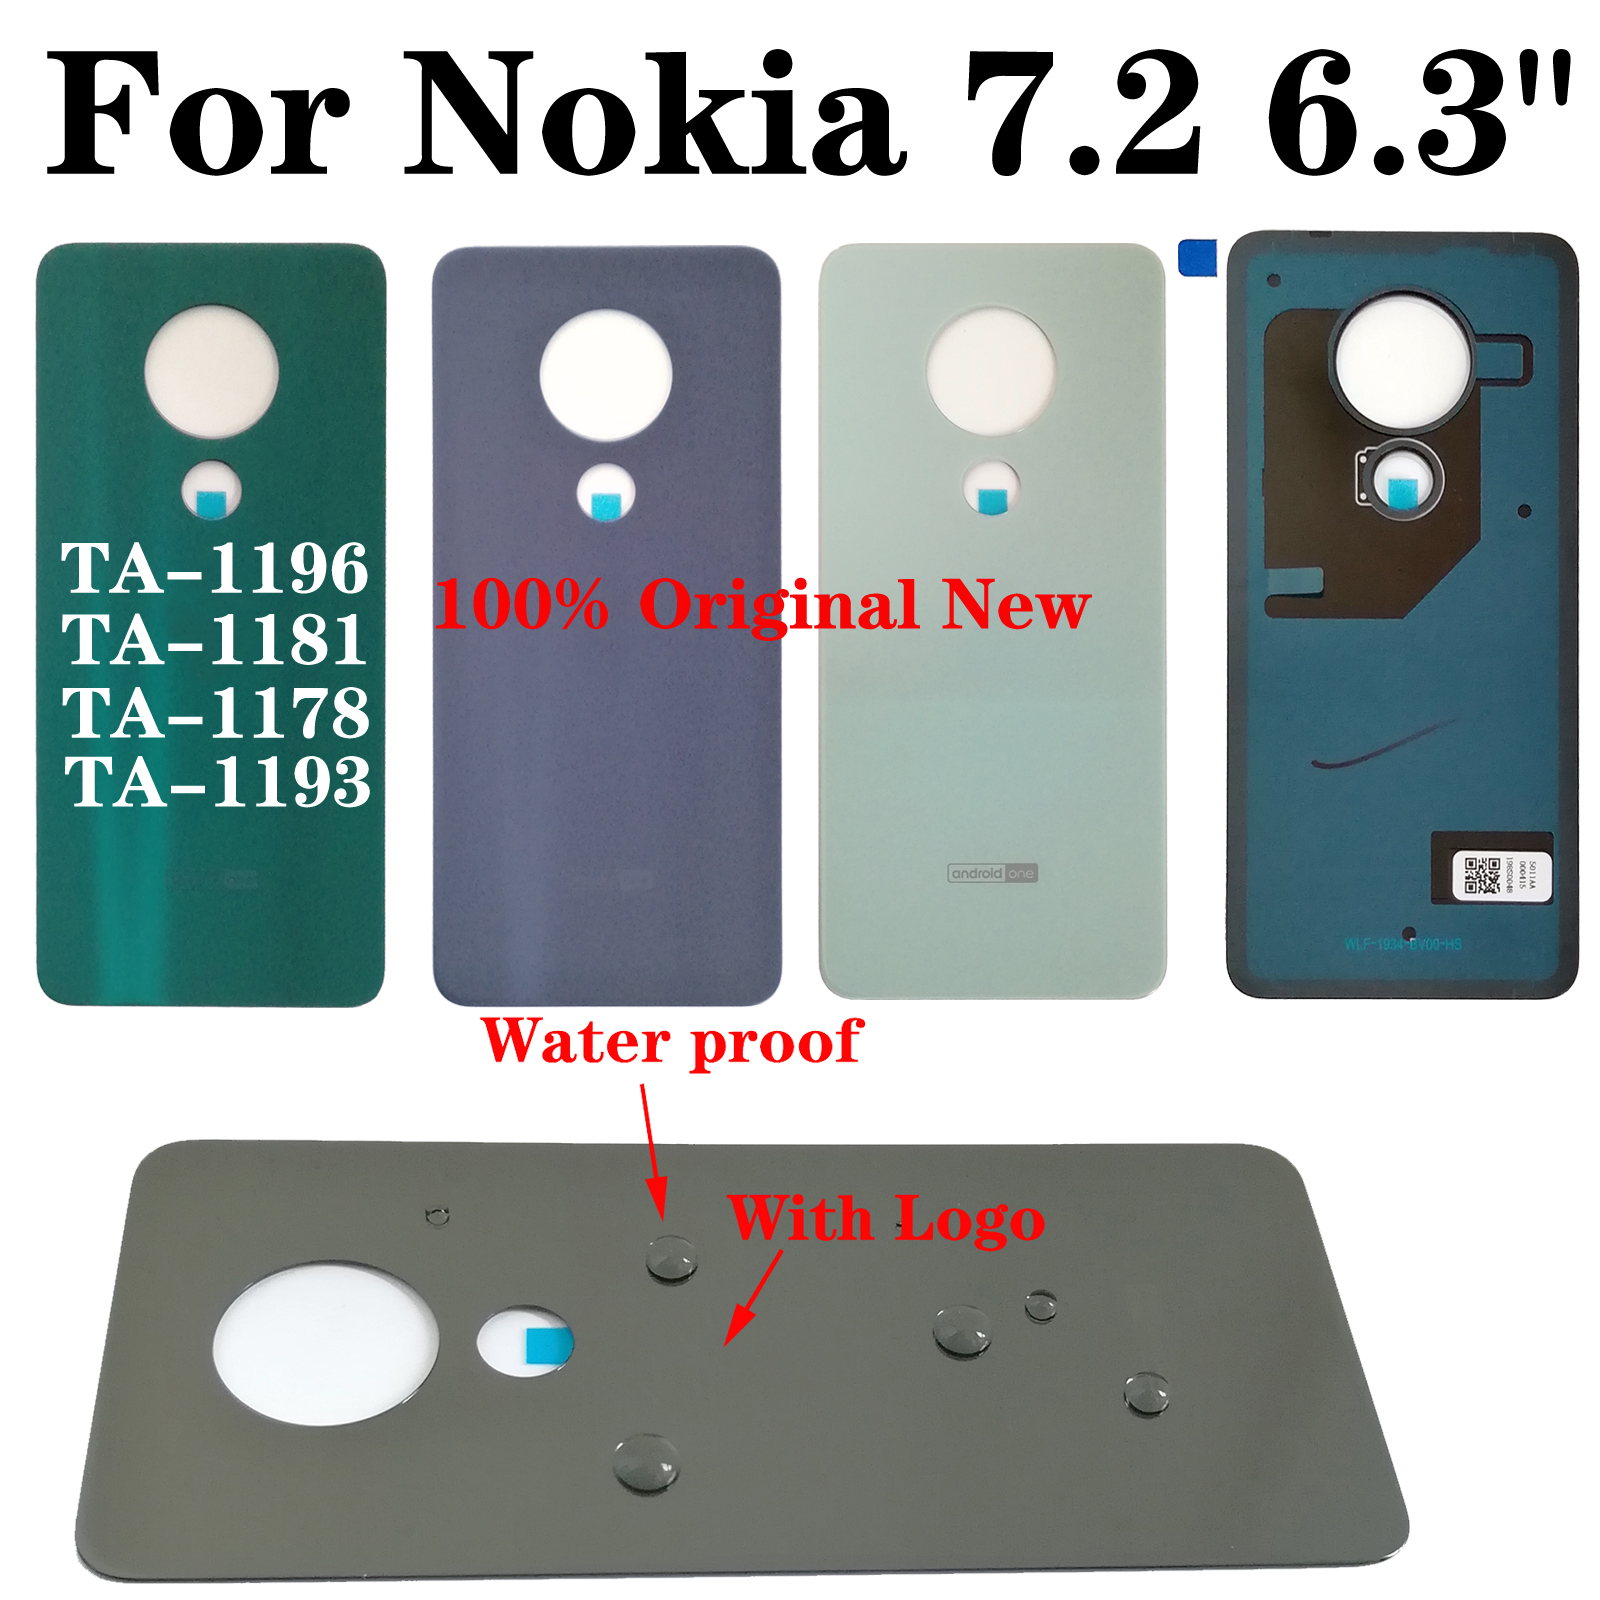 "Shyueda 100% Original New 6.3"" For Nokia 7.2 TA-1196 TA-1181 TA-1178 TA-1193 Glass Rear Back Door Housing Battery Cover(China)"